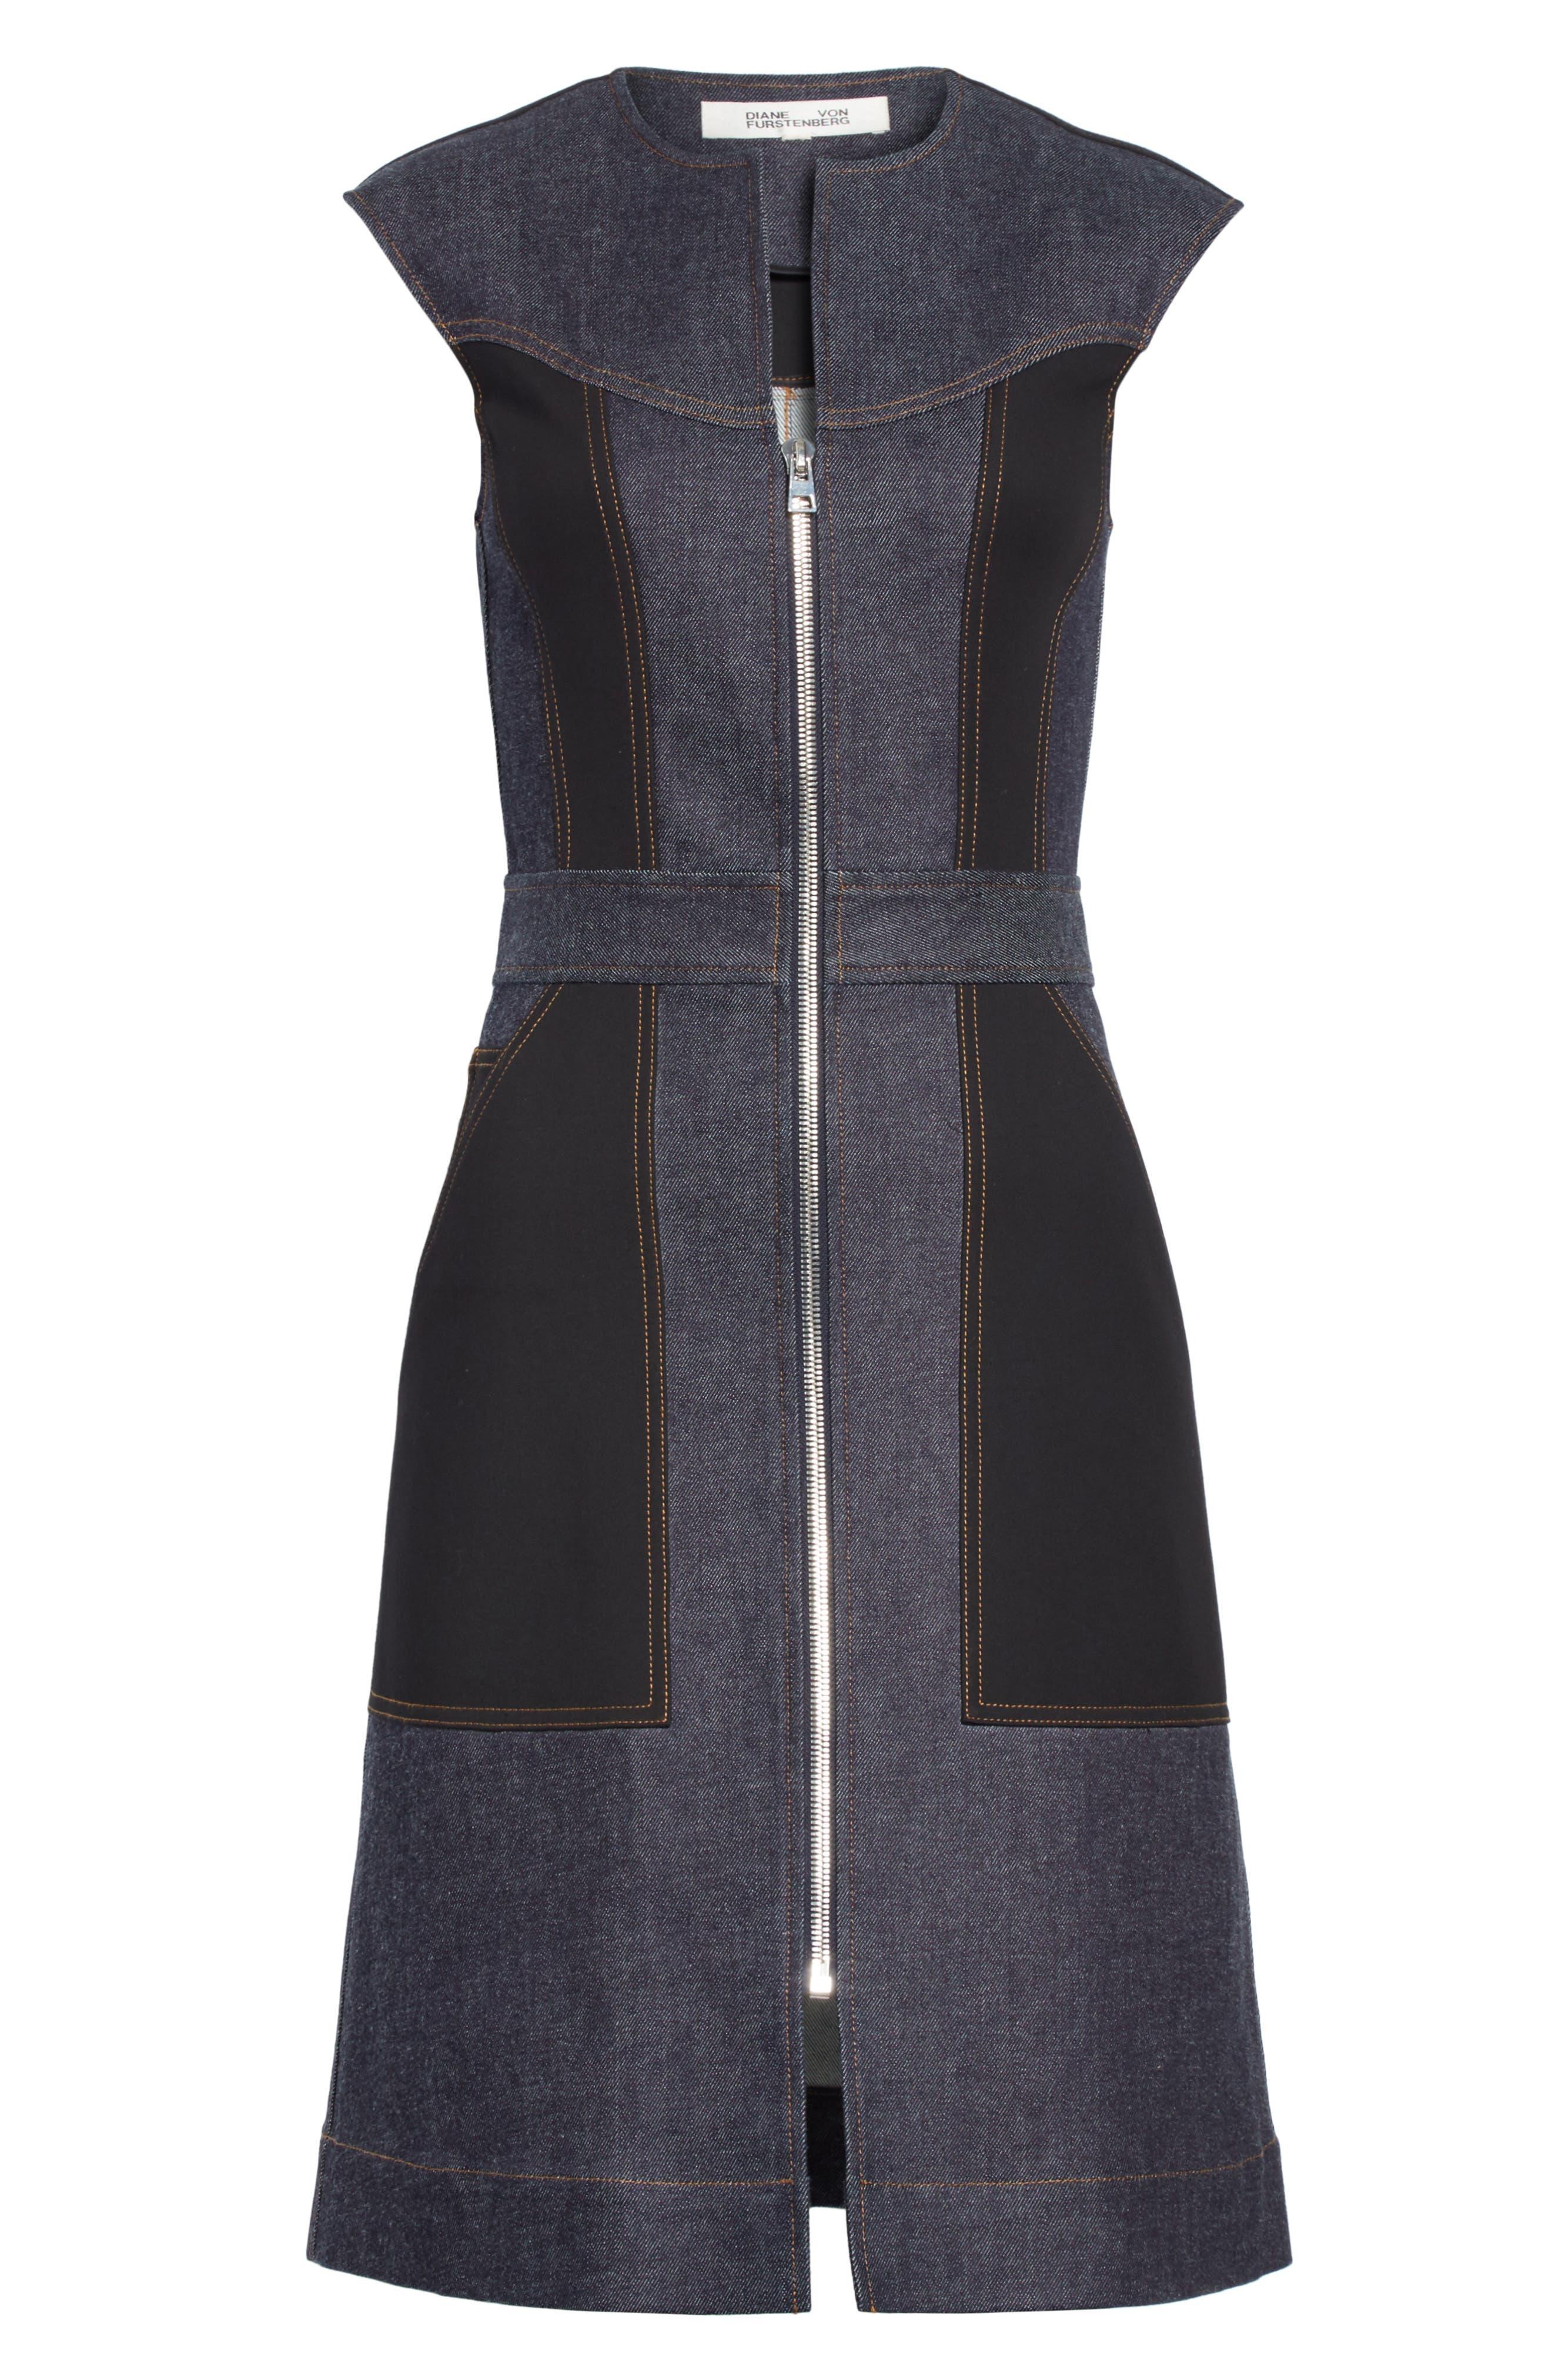 Diane von Furstenberg Front Zip Denim Dress,                             Alternate thumbnail 6, color,